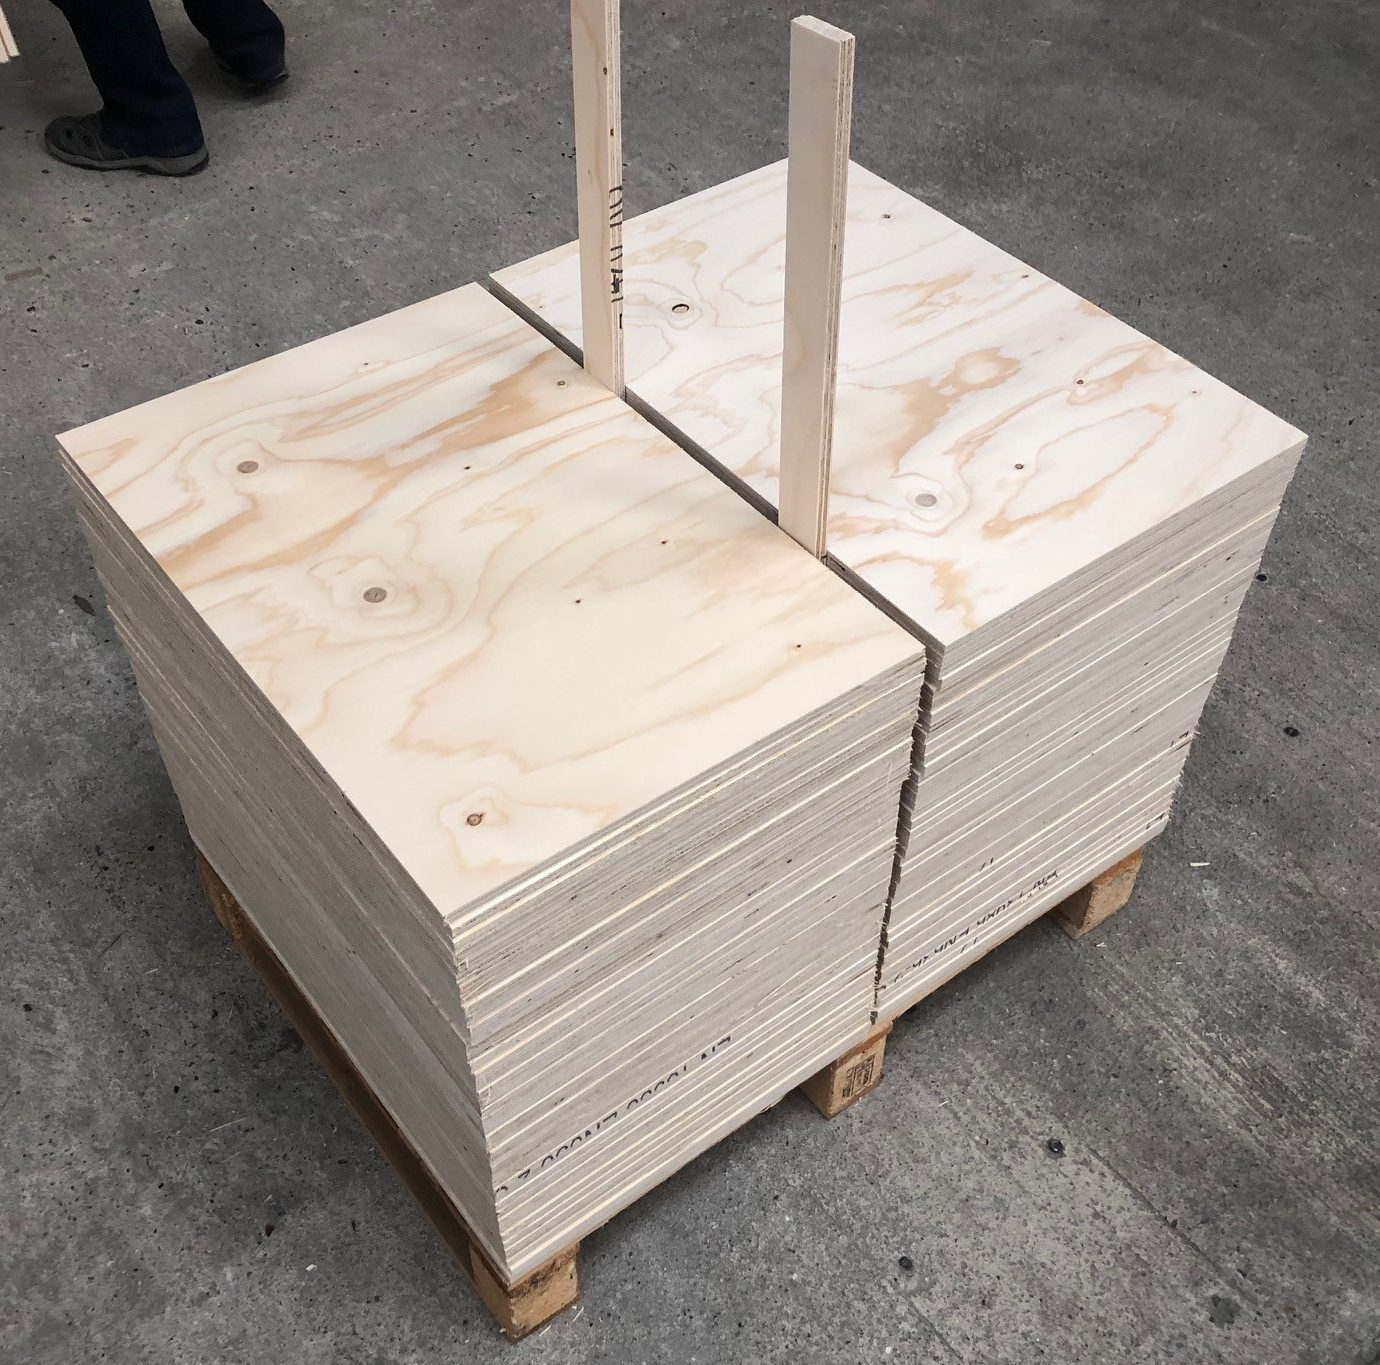 sperrholzdeckel 1200 x 800 mm f r europaletten. Black Bedroom Furniture Sets. Home Design Ideas